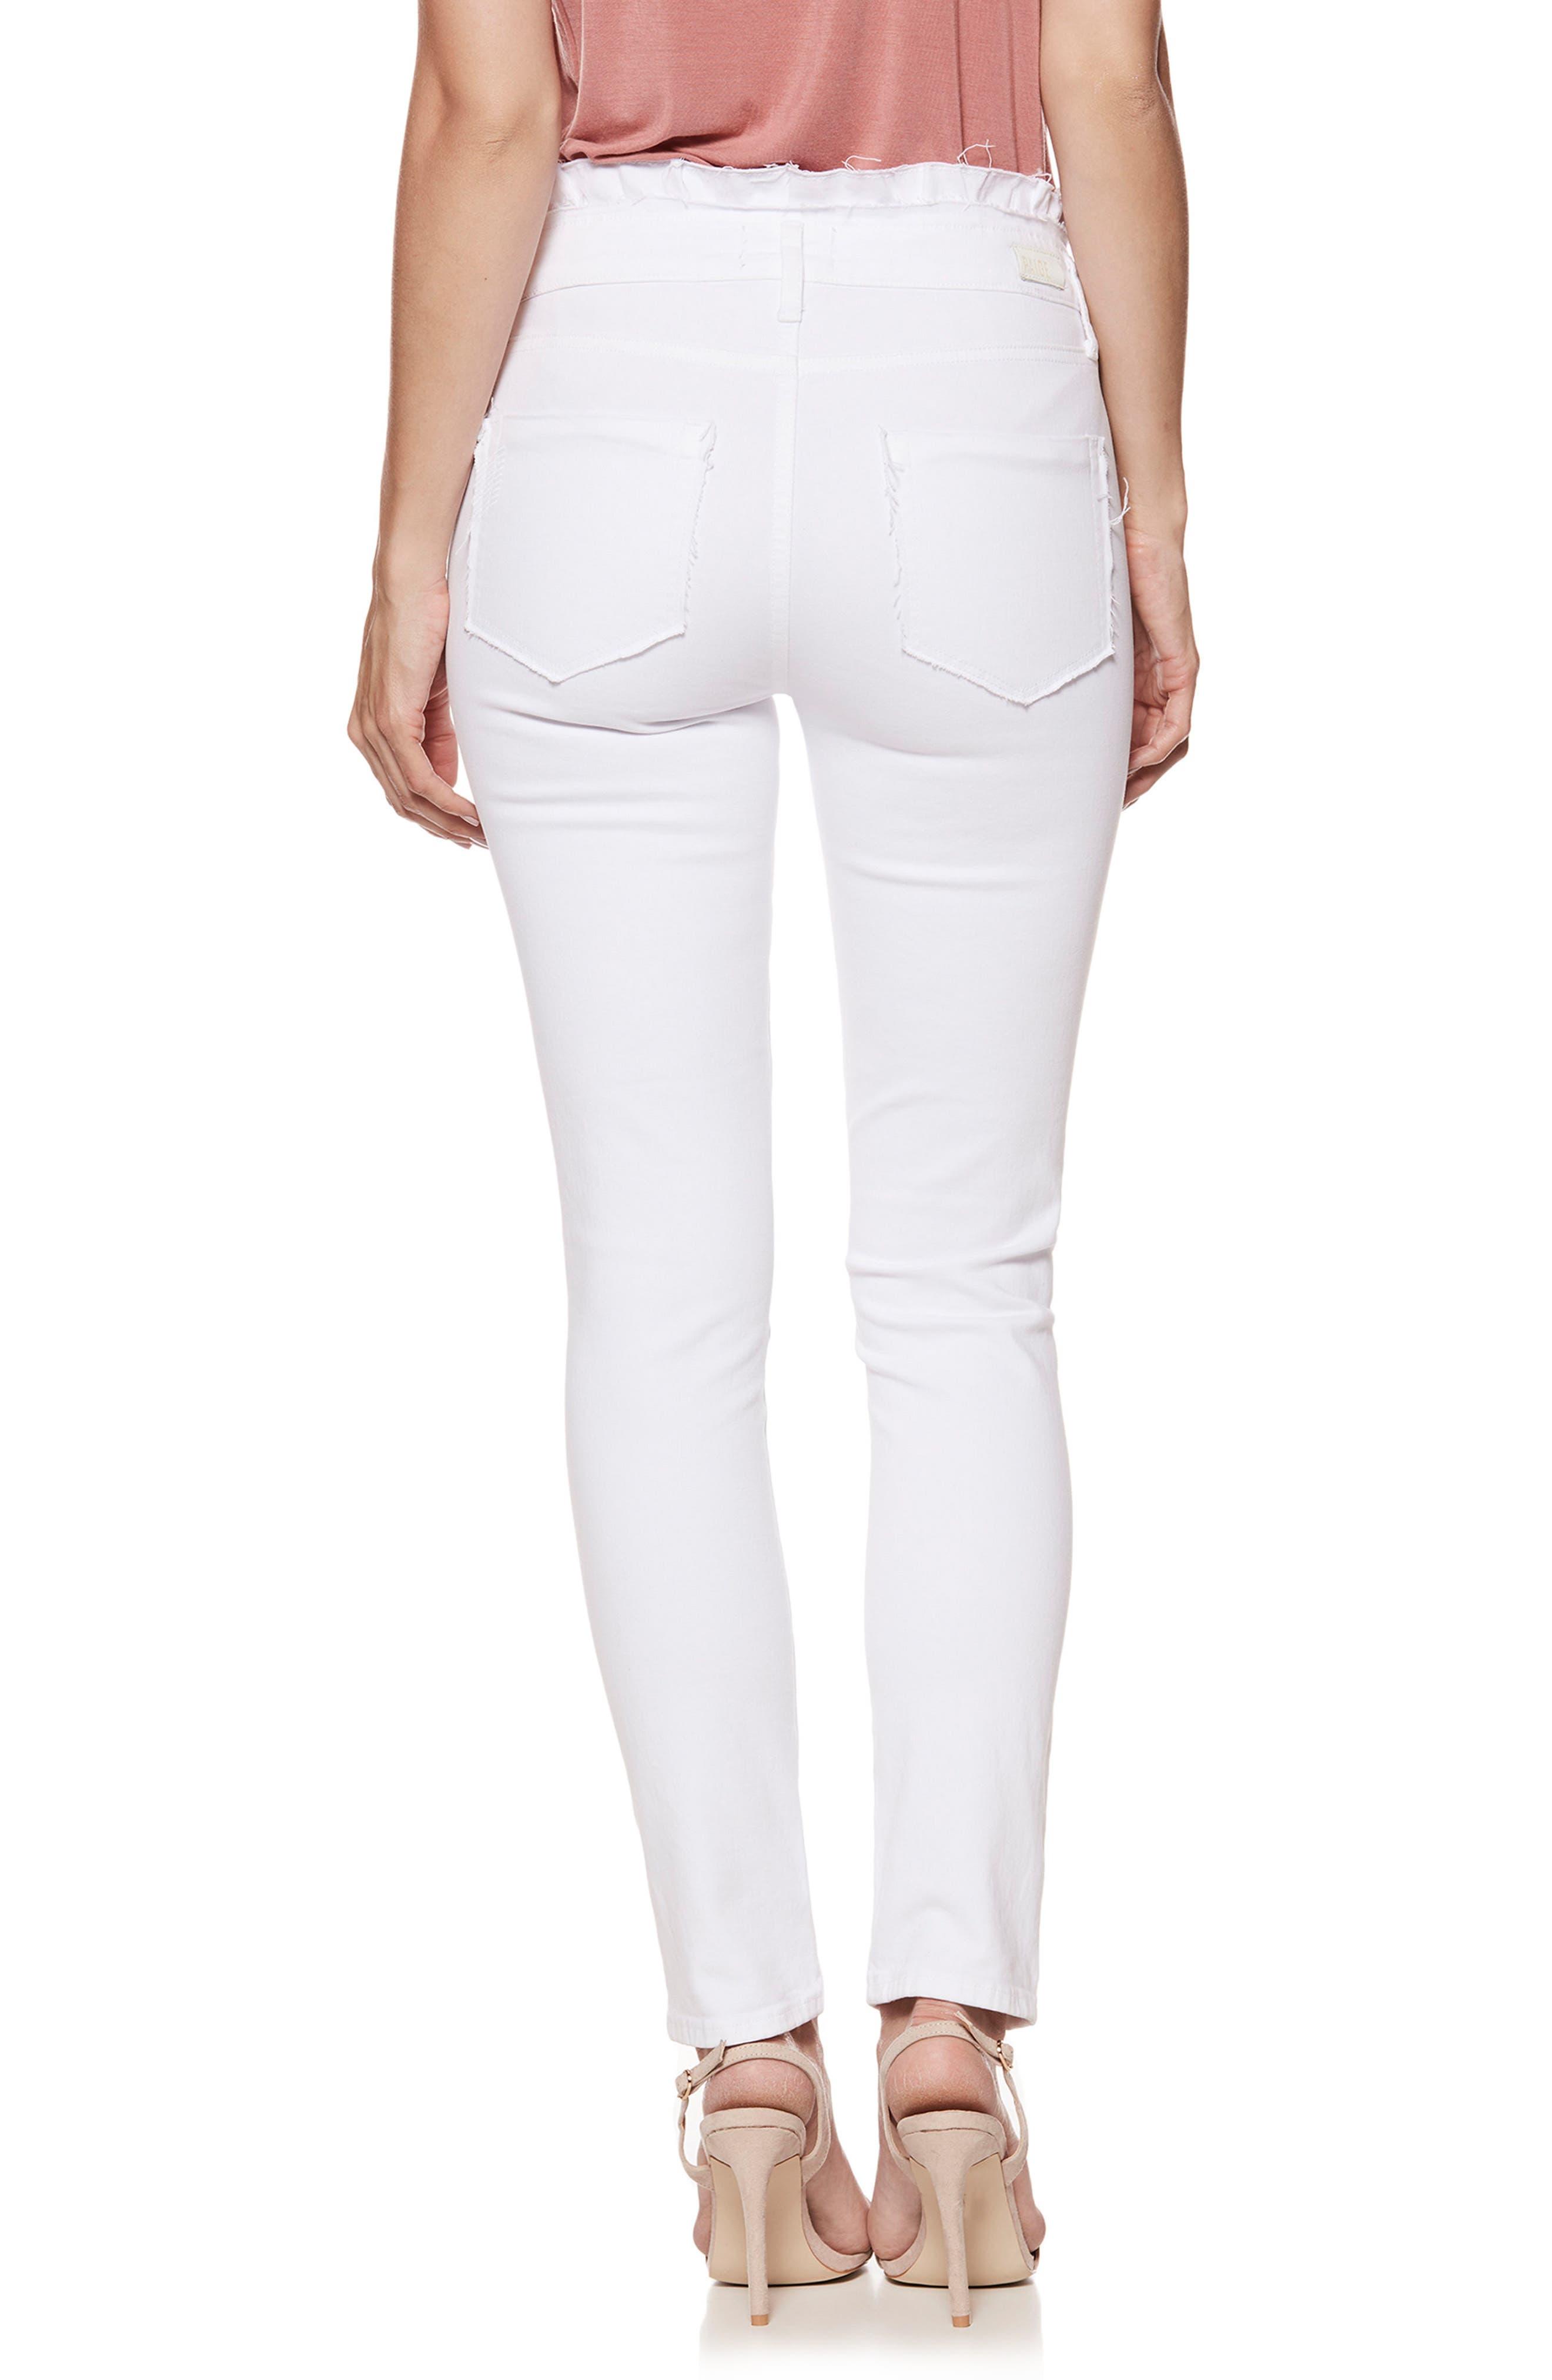 Hoxton Ruffle High Waist Ankle Ultra Skinny Jeans,                             Alternate thumbnail 2, color,                             CRISP WHITE